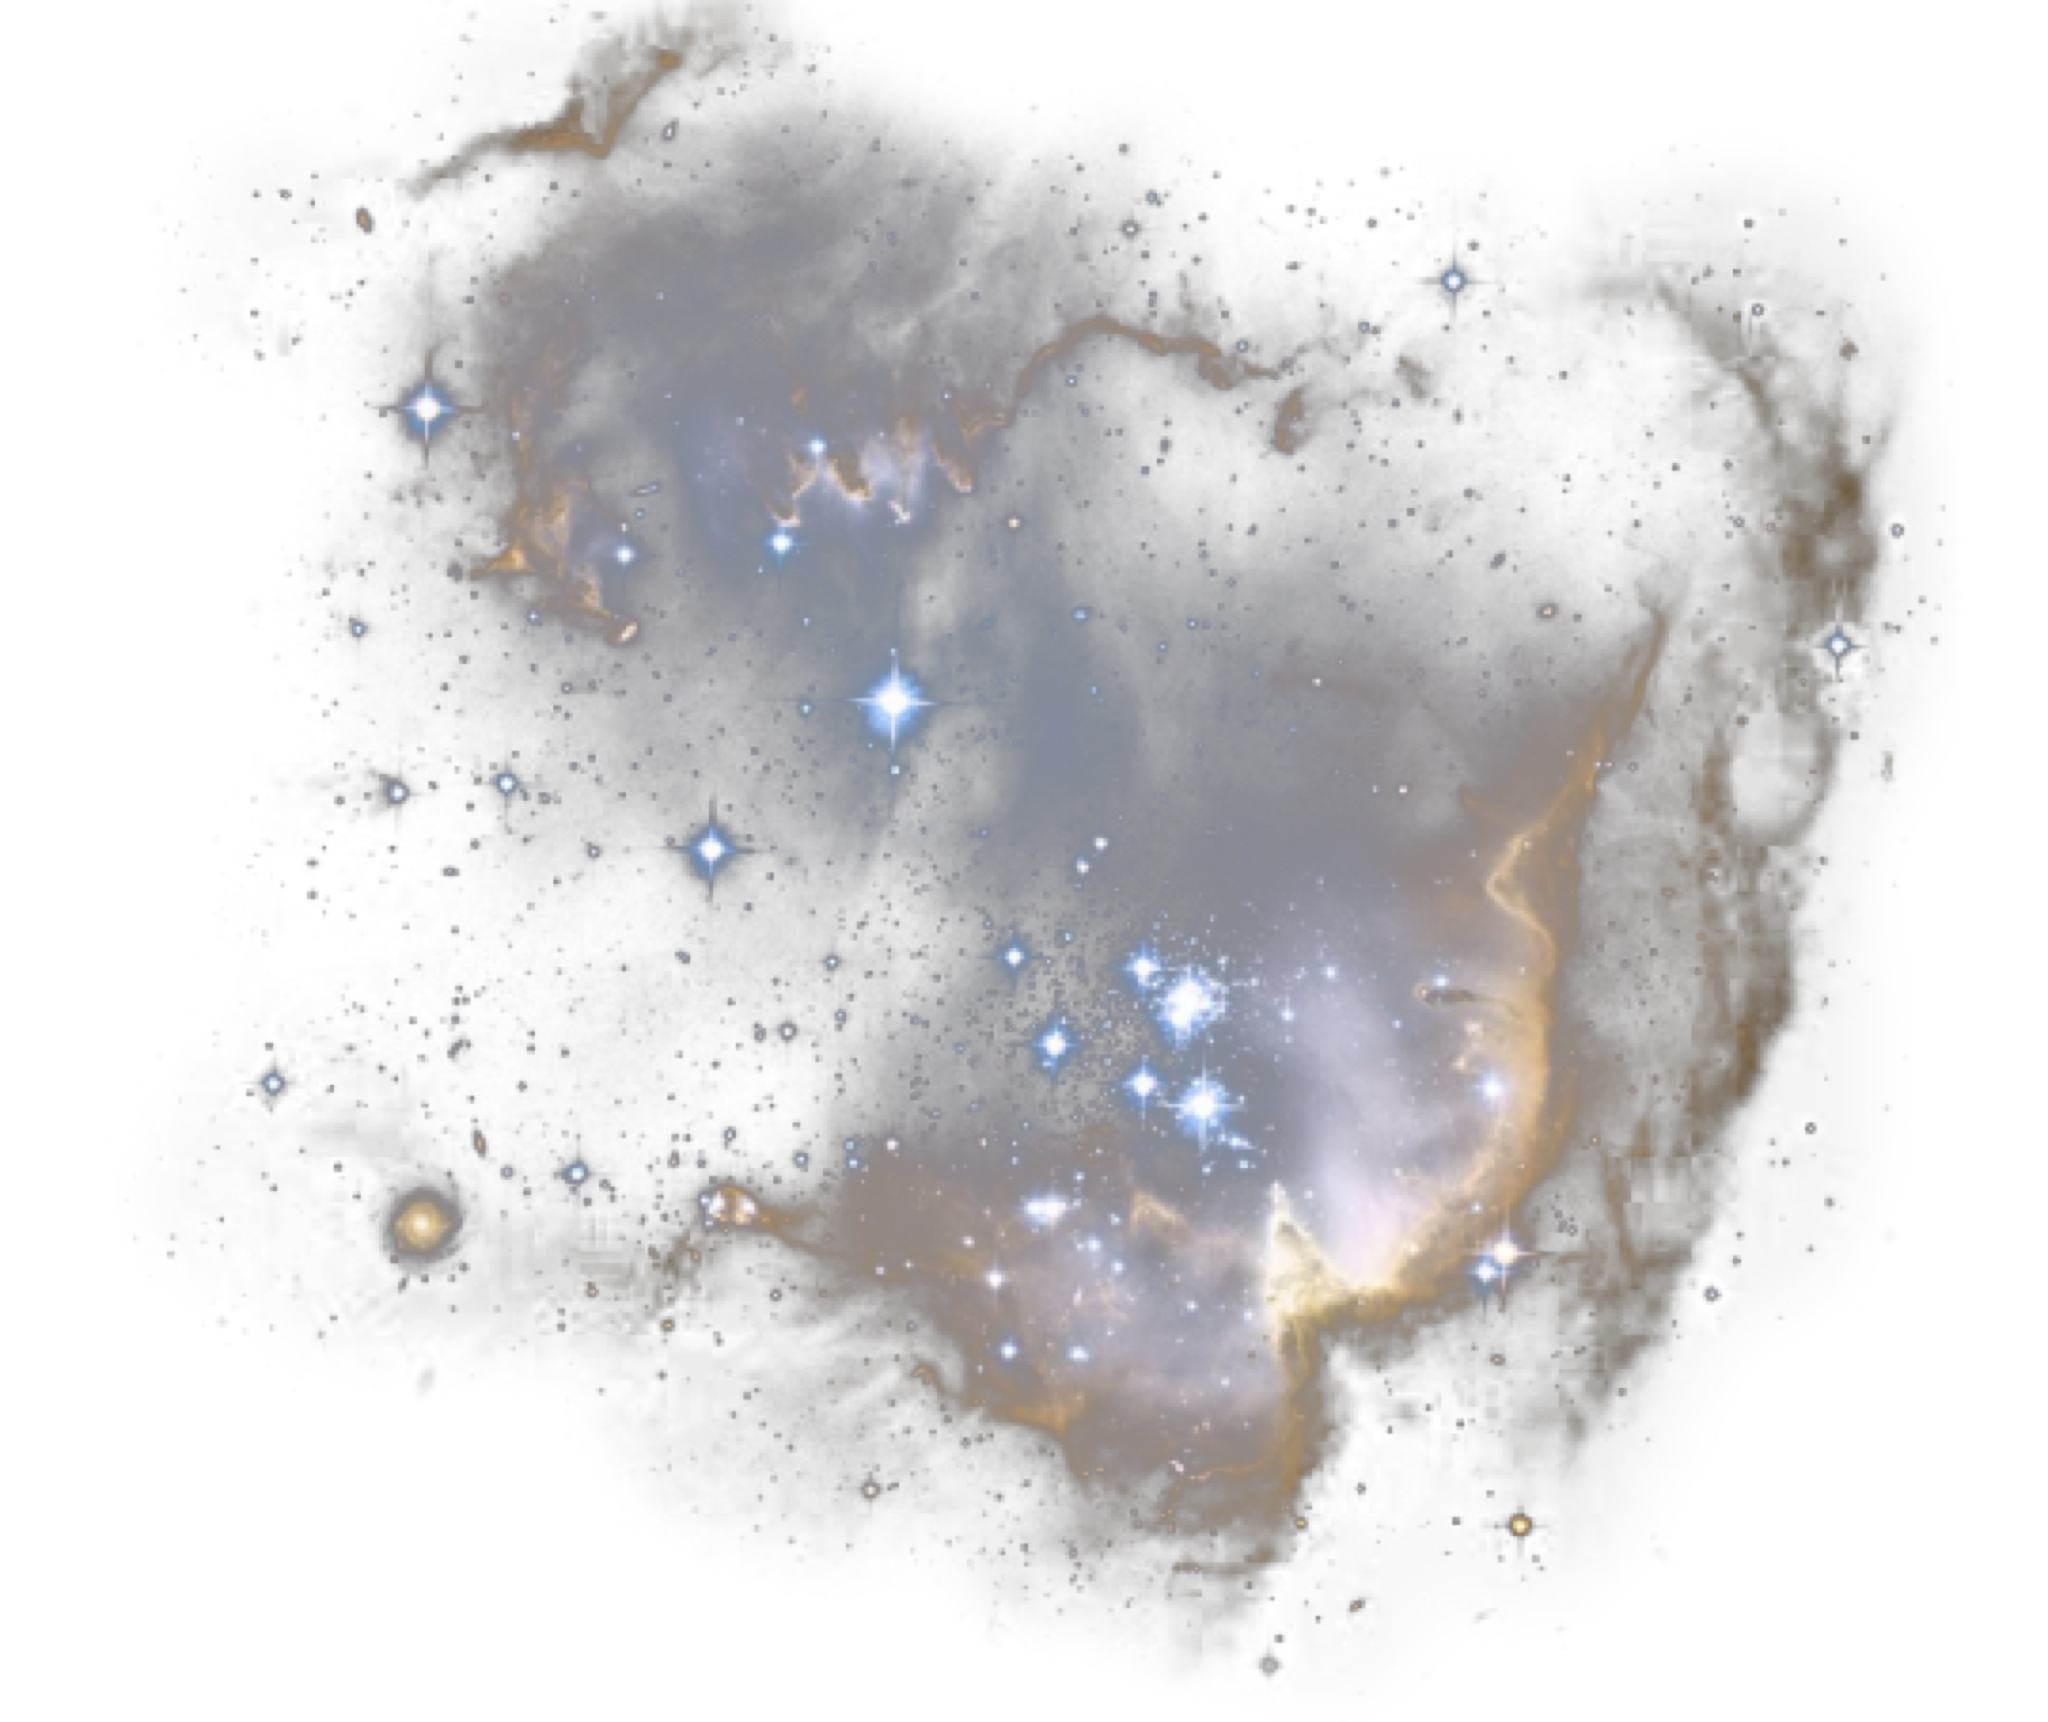 star space transparent - HD1024×861